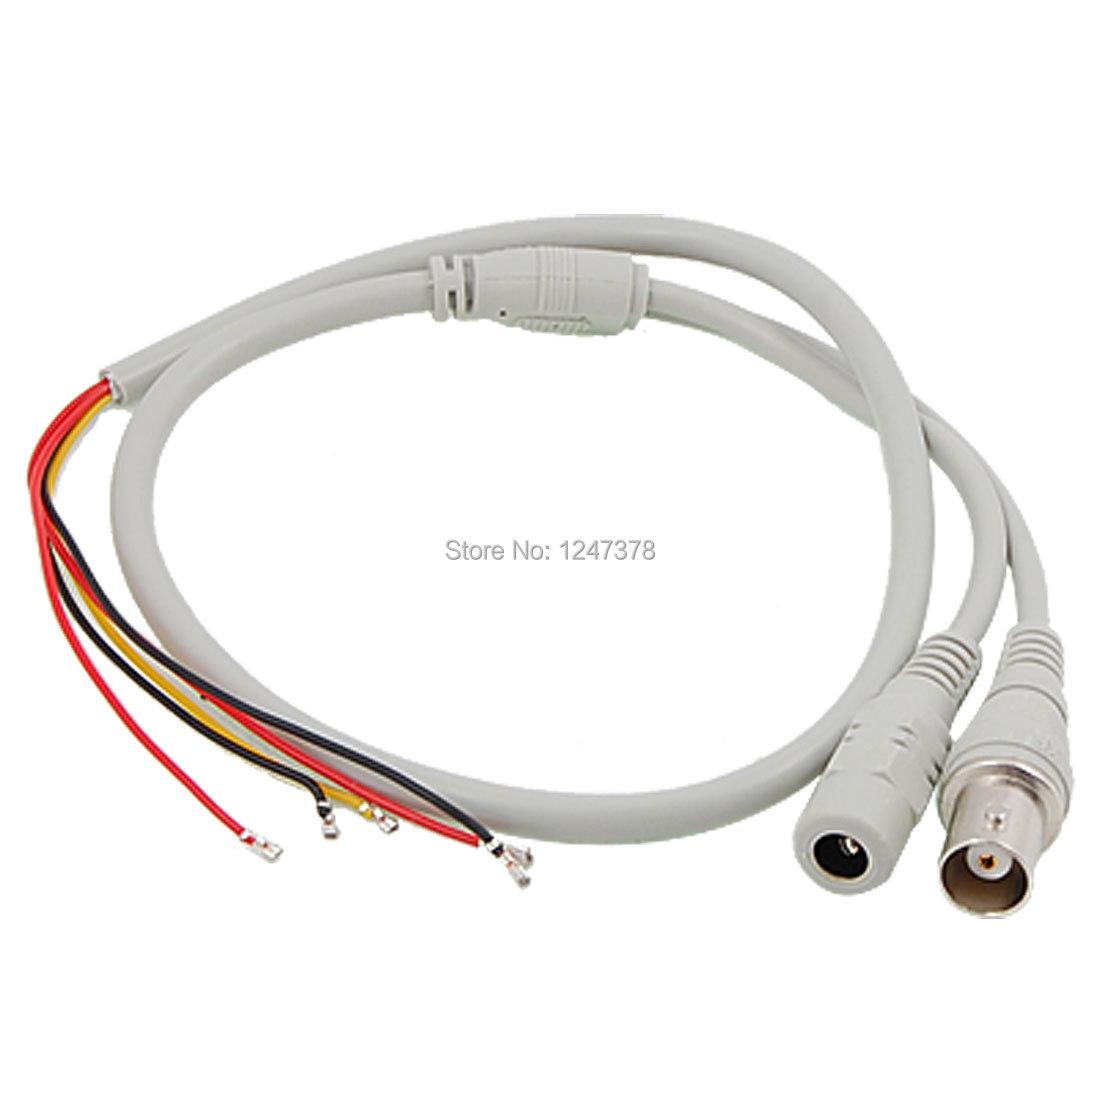 CCTV System 2.1x5.5mm Female DC Power Jack BNC Plug to 2P 3P Splitter Cable(China (Mainland))